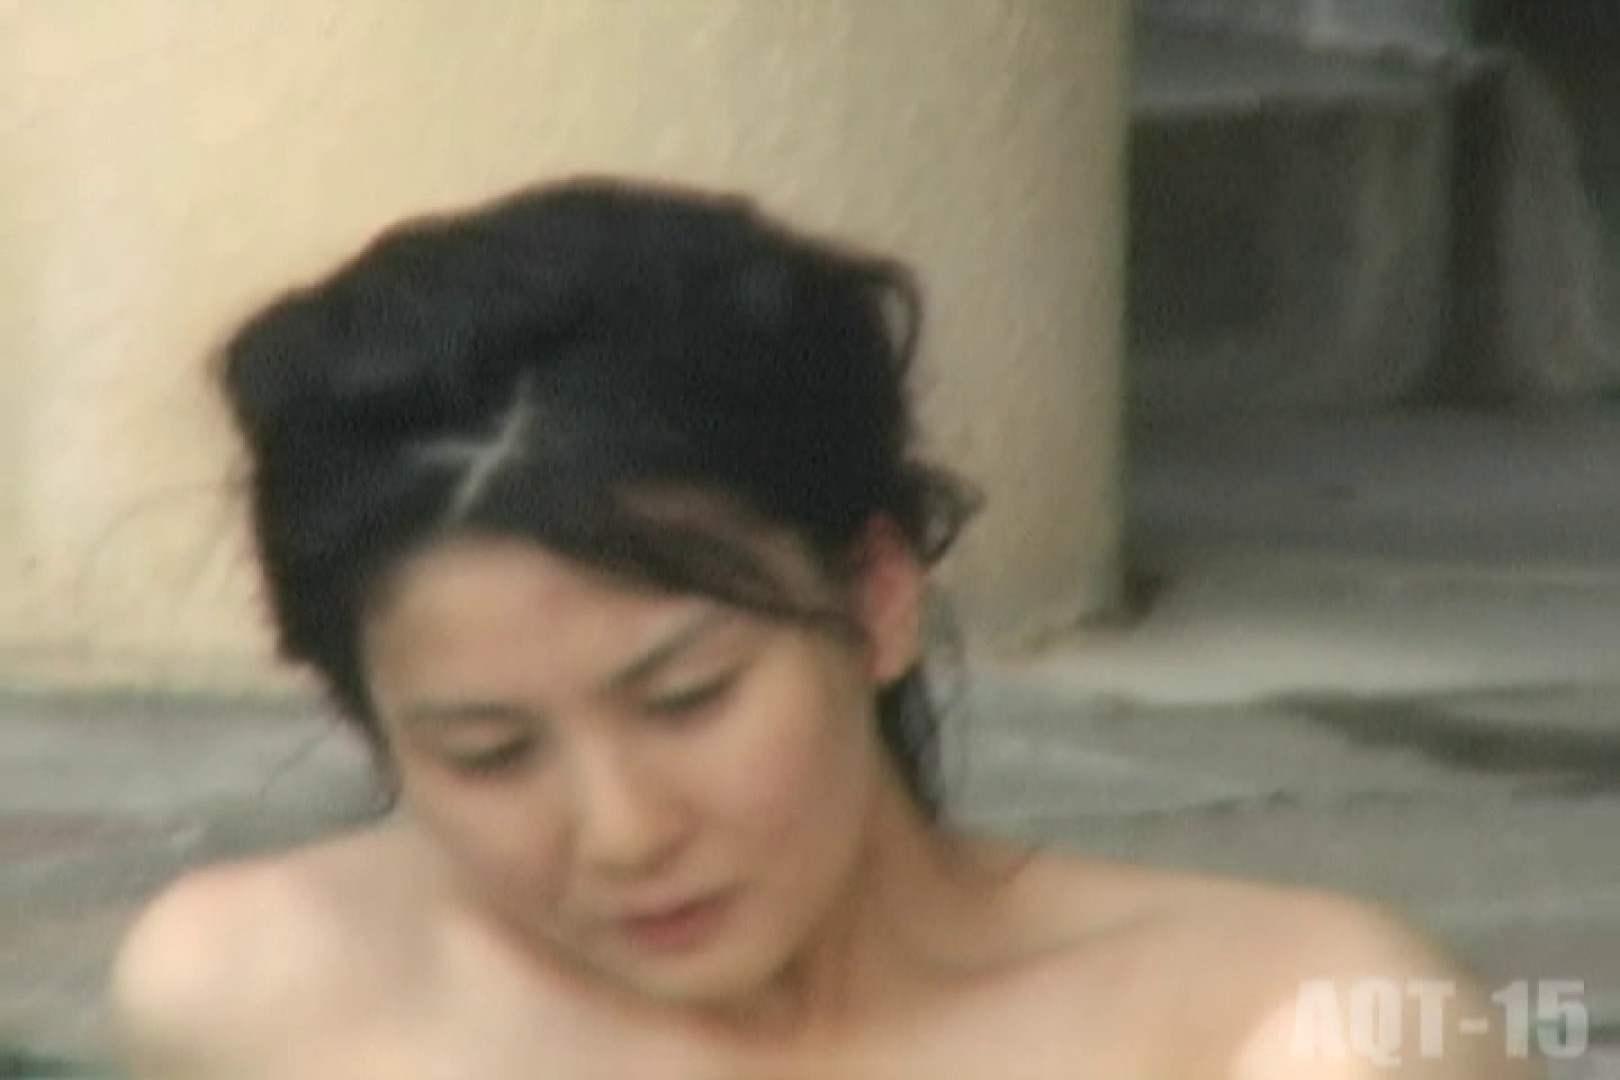 Aquaな露天風呂Vol.832 露天 オマンコ無修正動画無料 93連発 14